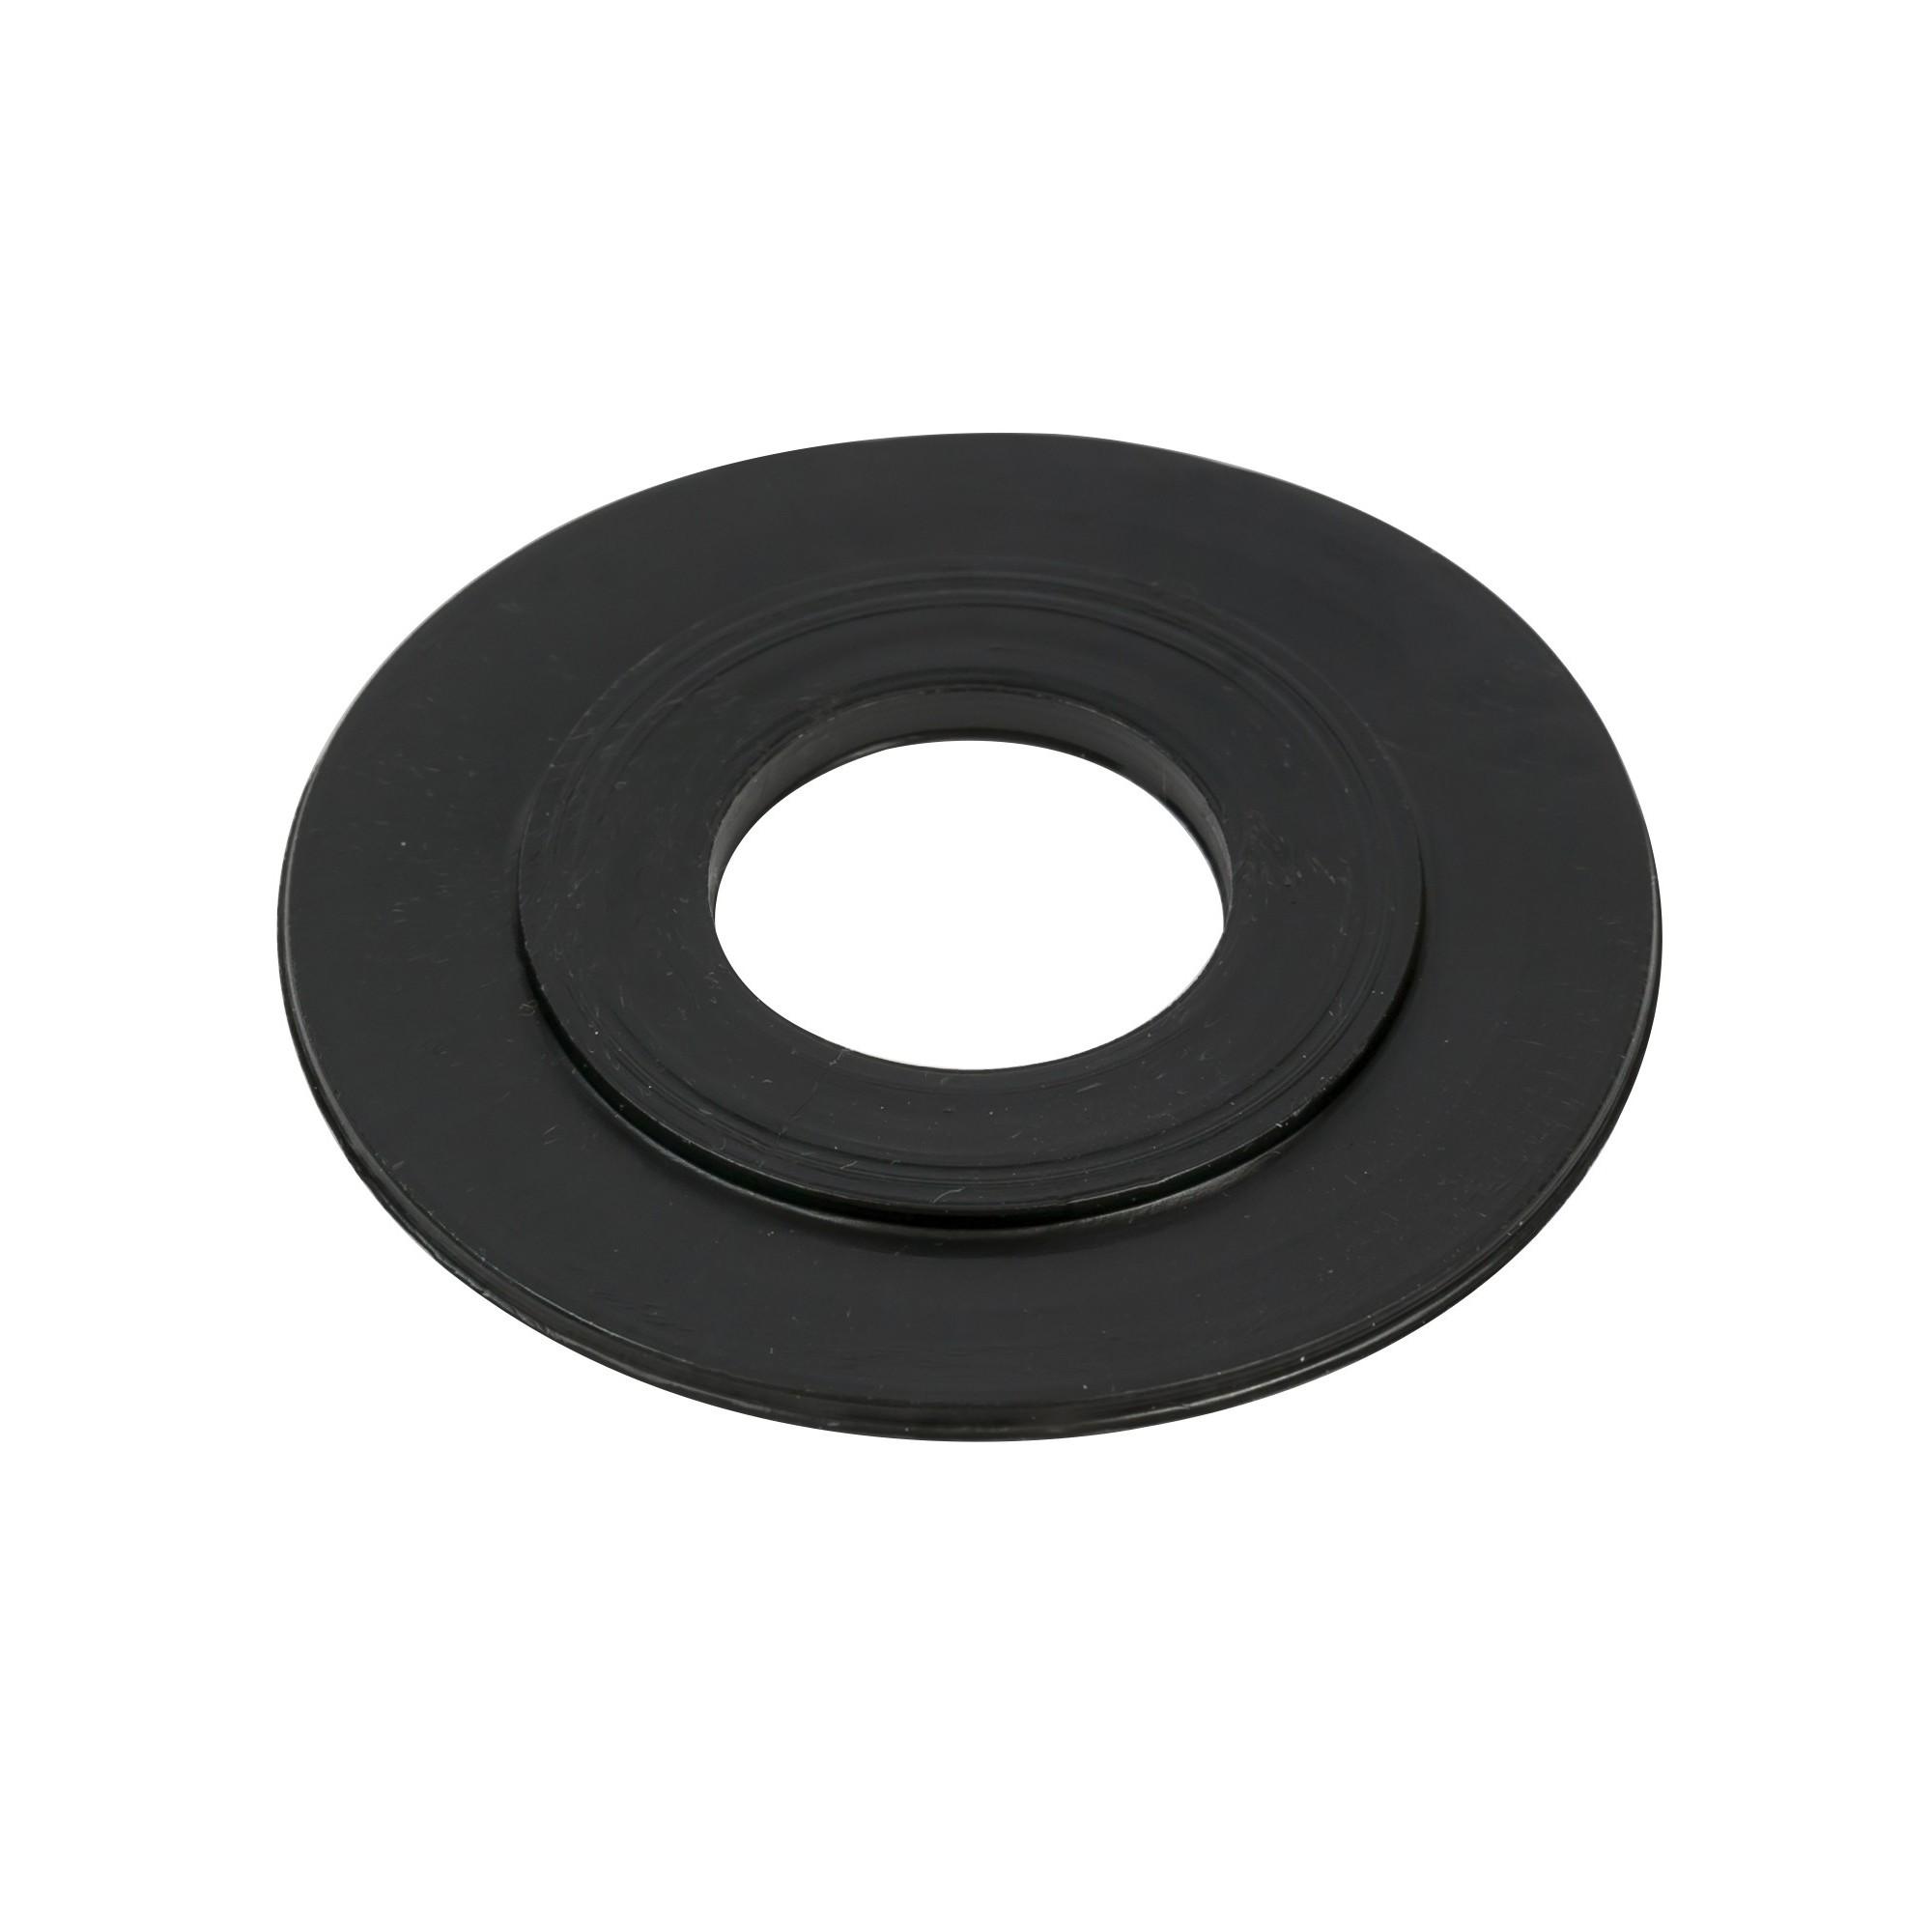 Упаковка мембран 10 шт для бачка унитаза 67мм*25мм, резина  - 1